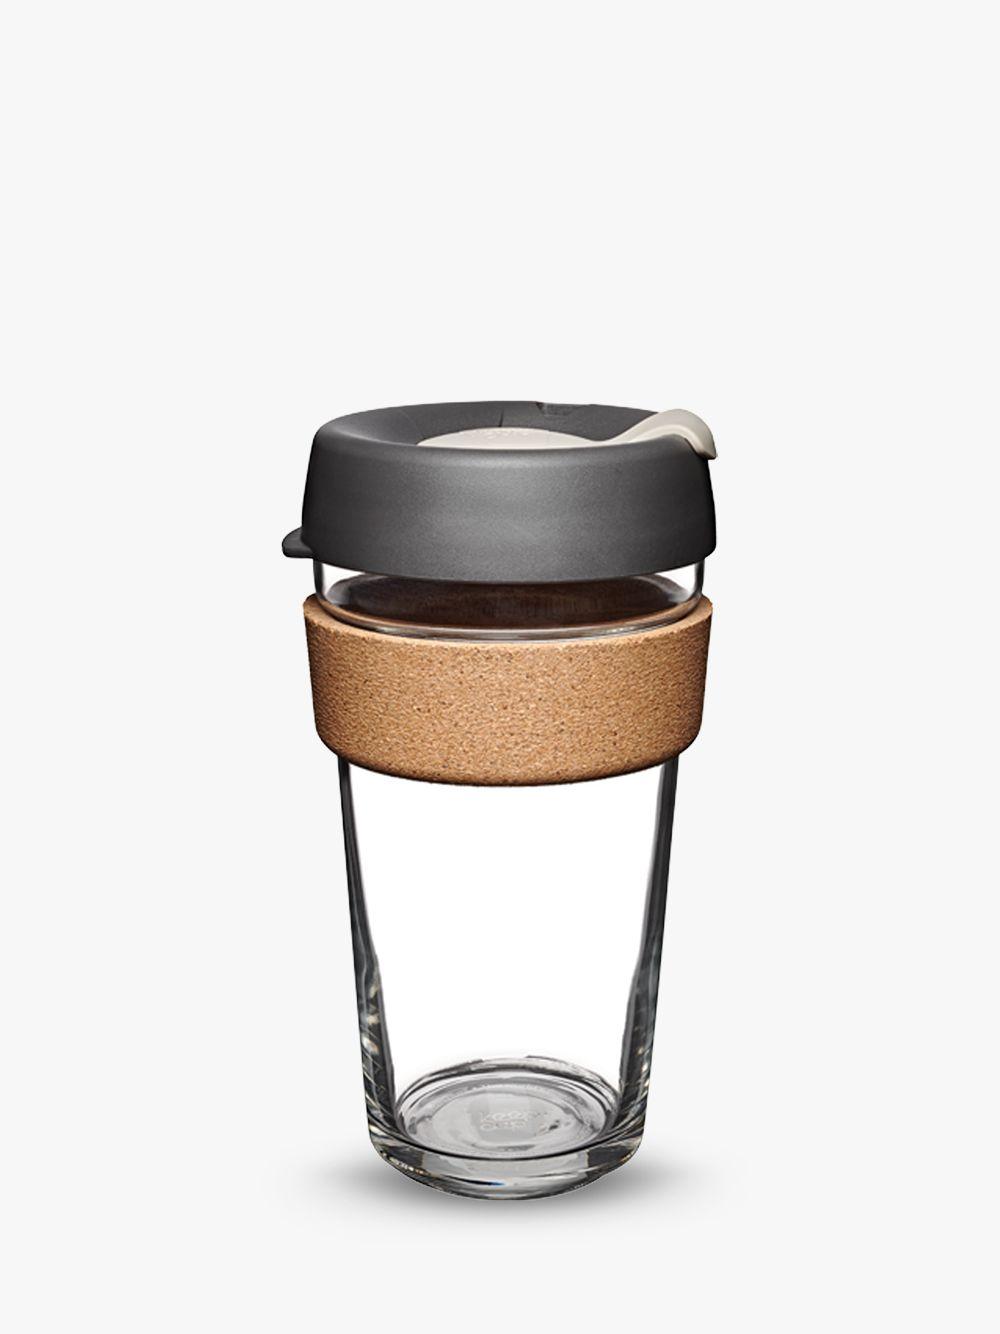 KeepCup Cork Brew Reusable 16oz Glass Coffee Cup / Travel Mug, 455ml